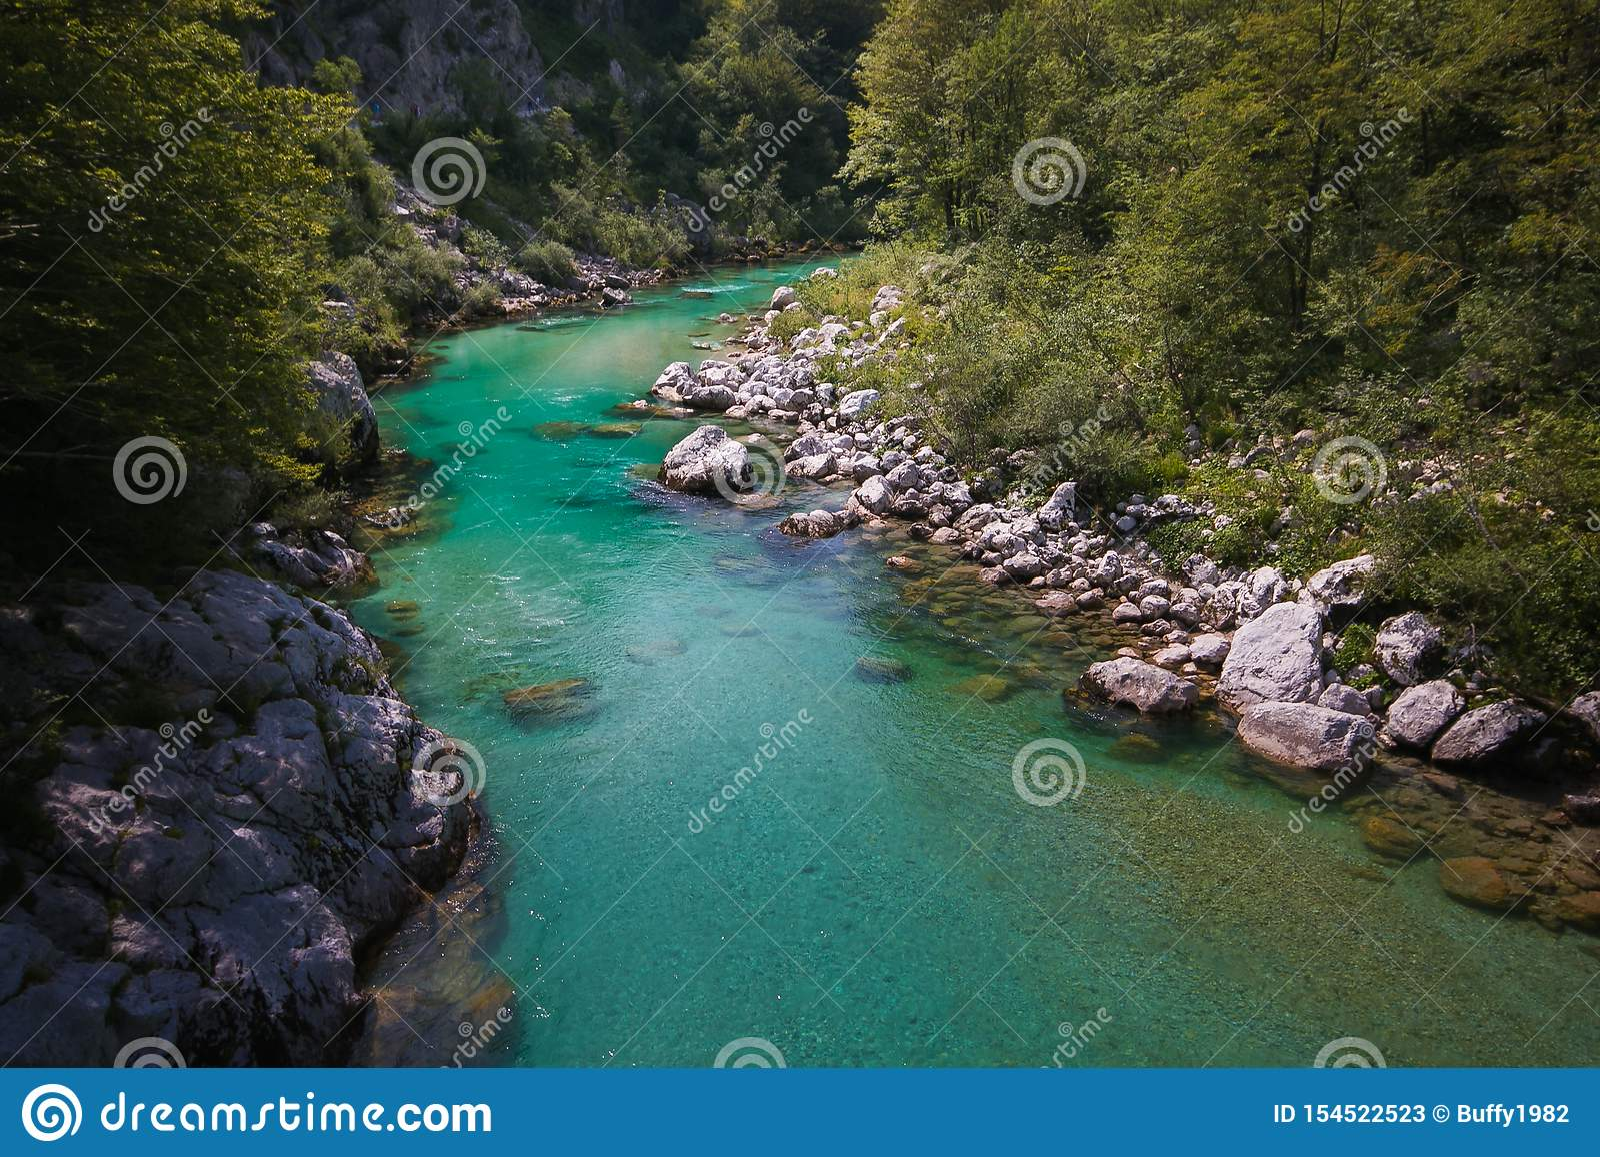 Fantastic view of Soca river near Kobarid in Slovenia